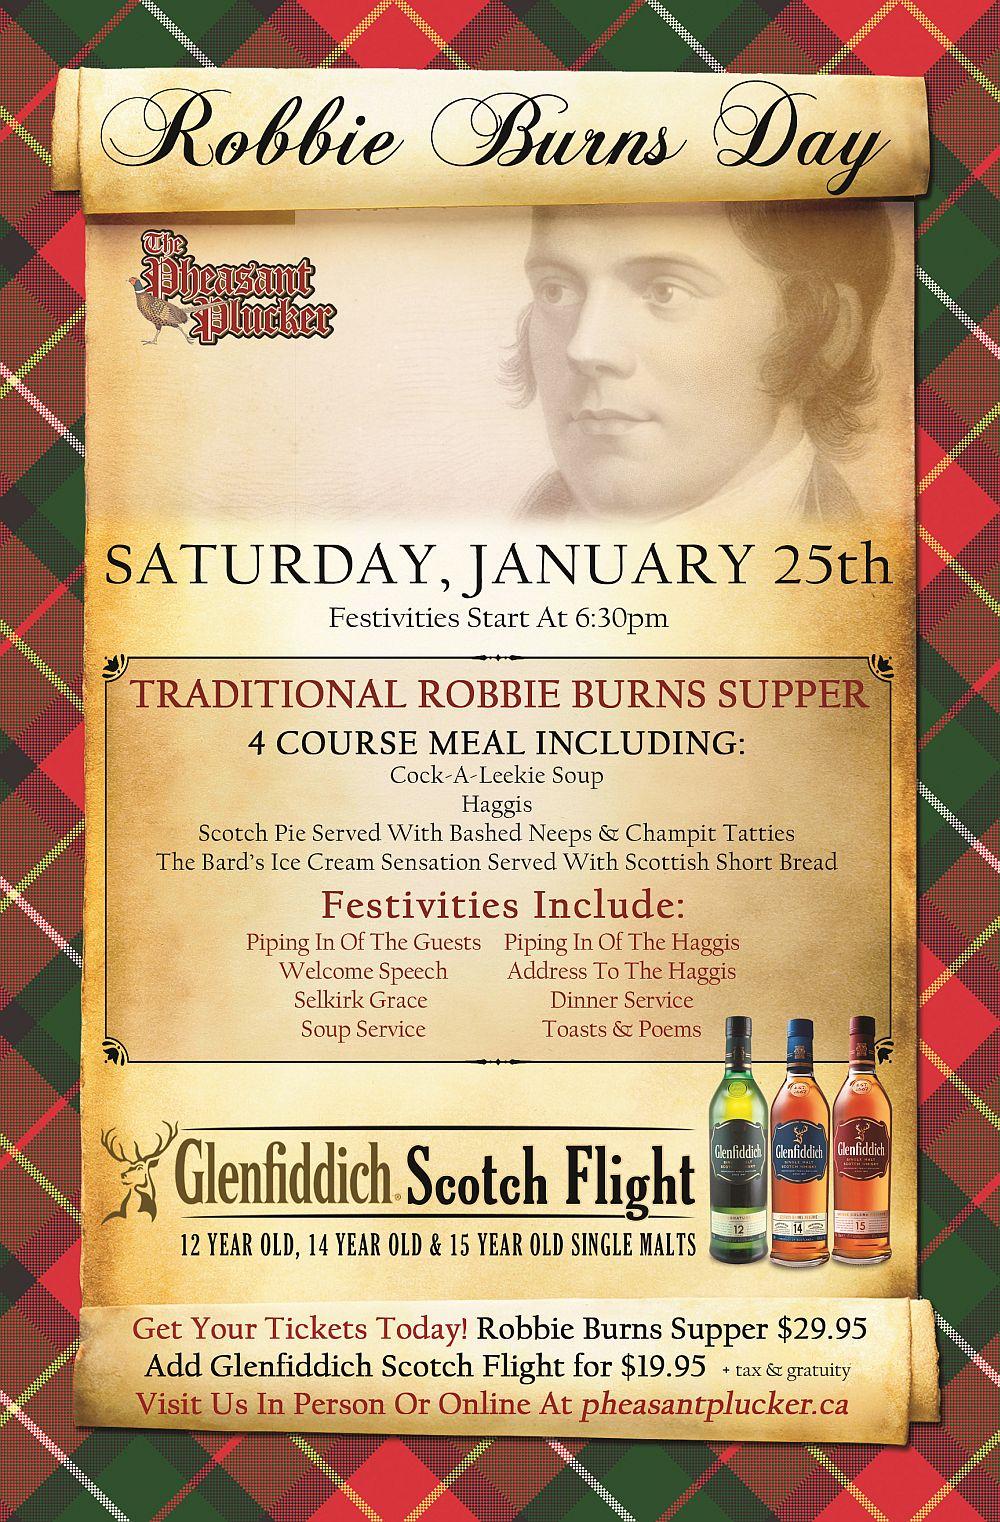 Robbie Burns Day - Saturday January 25th, 2020 - Pheasant Plucker